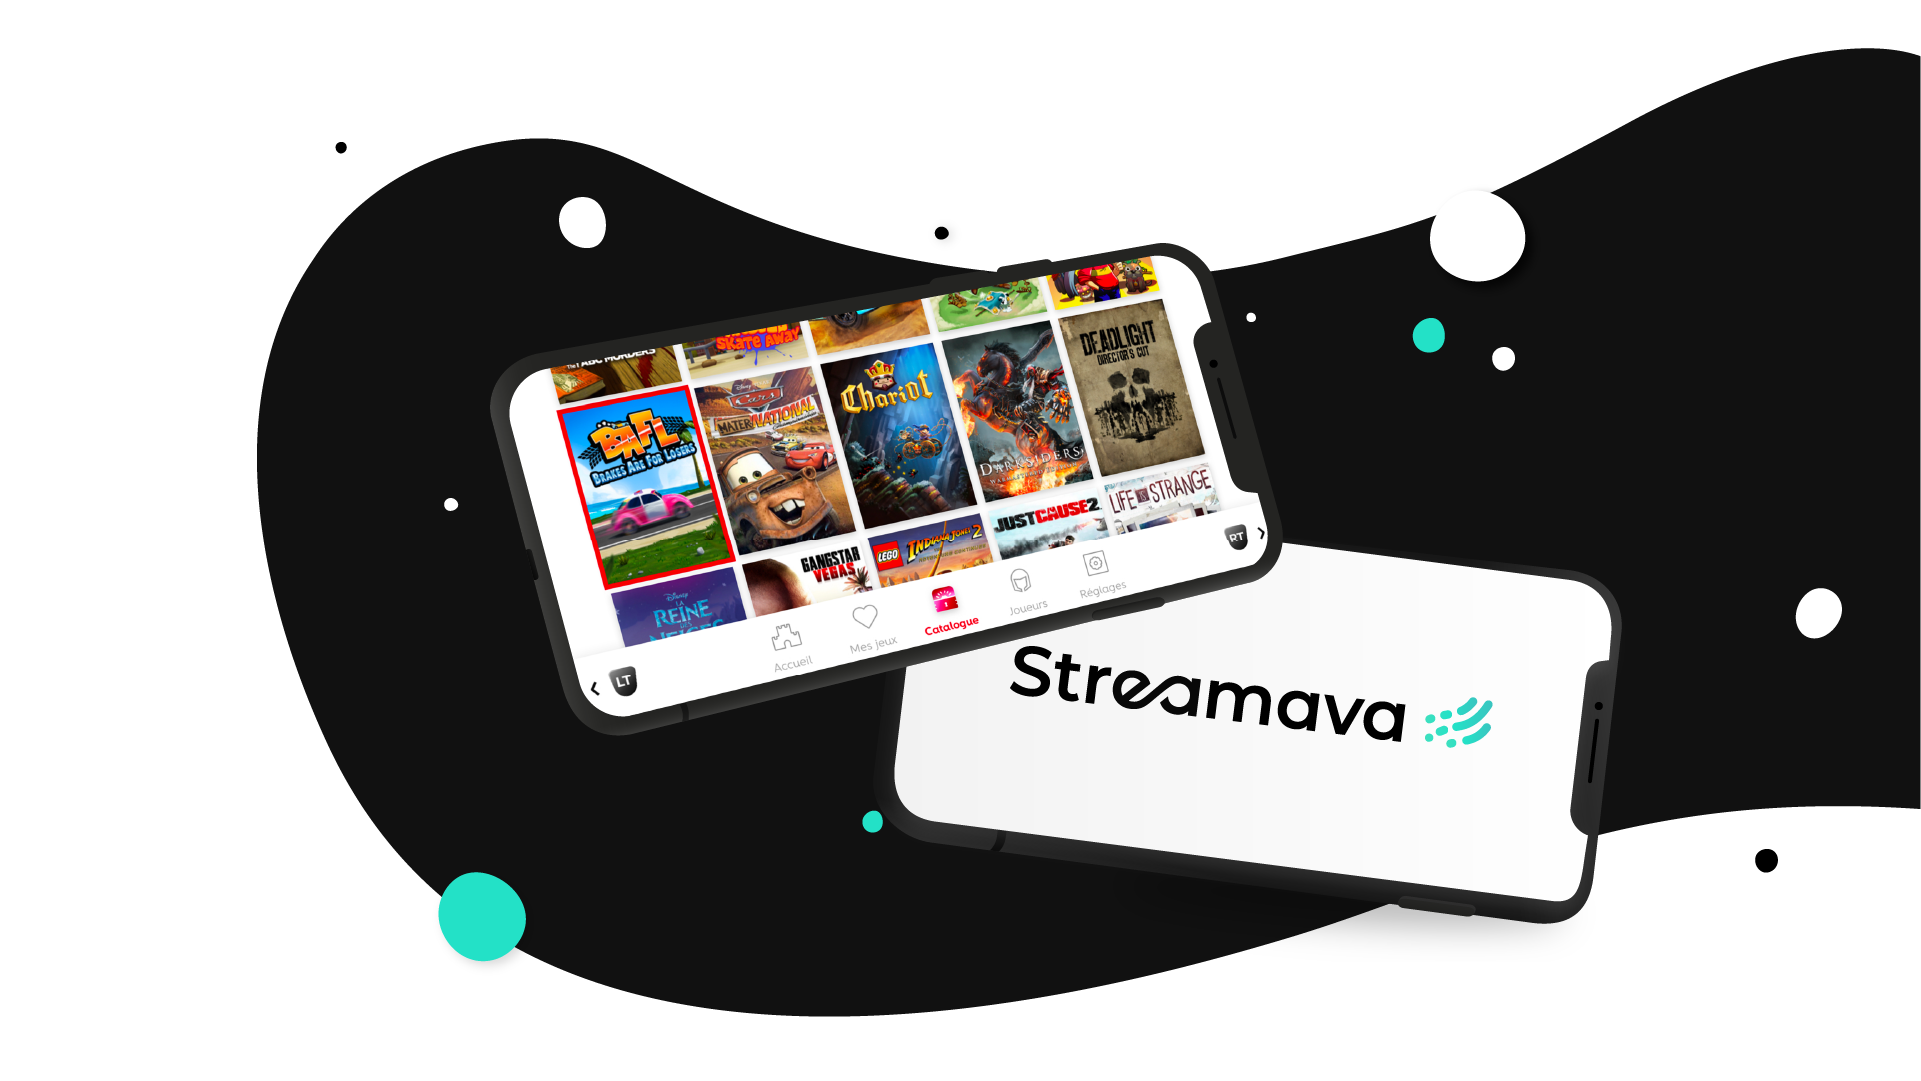 Streamava Mobile - News home